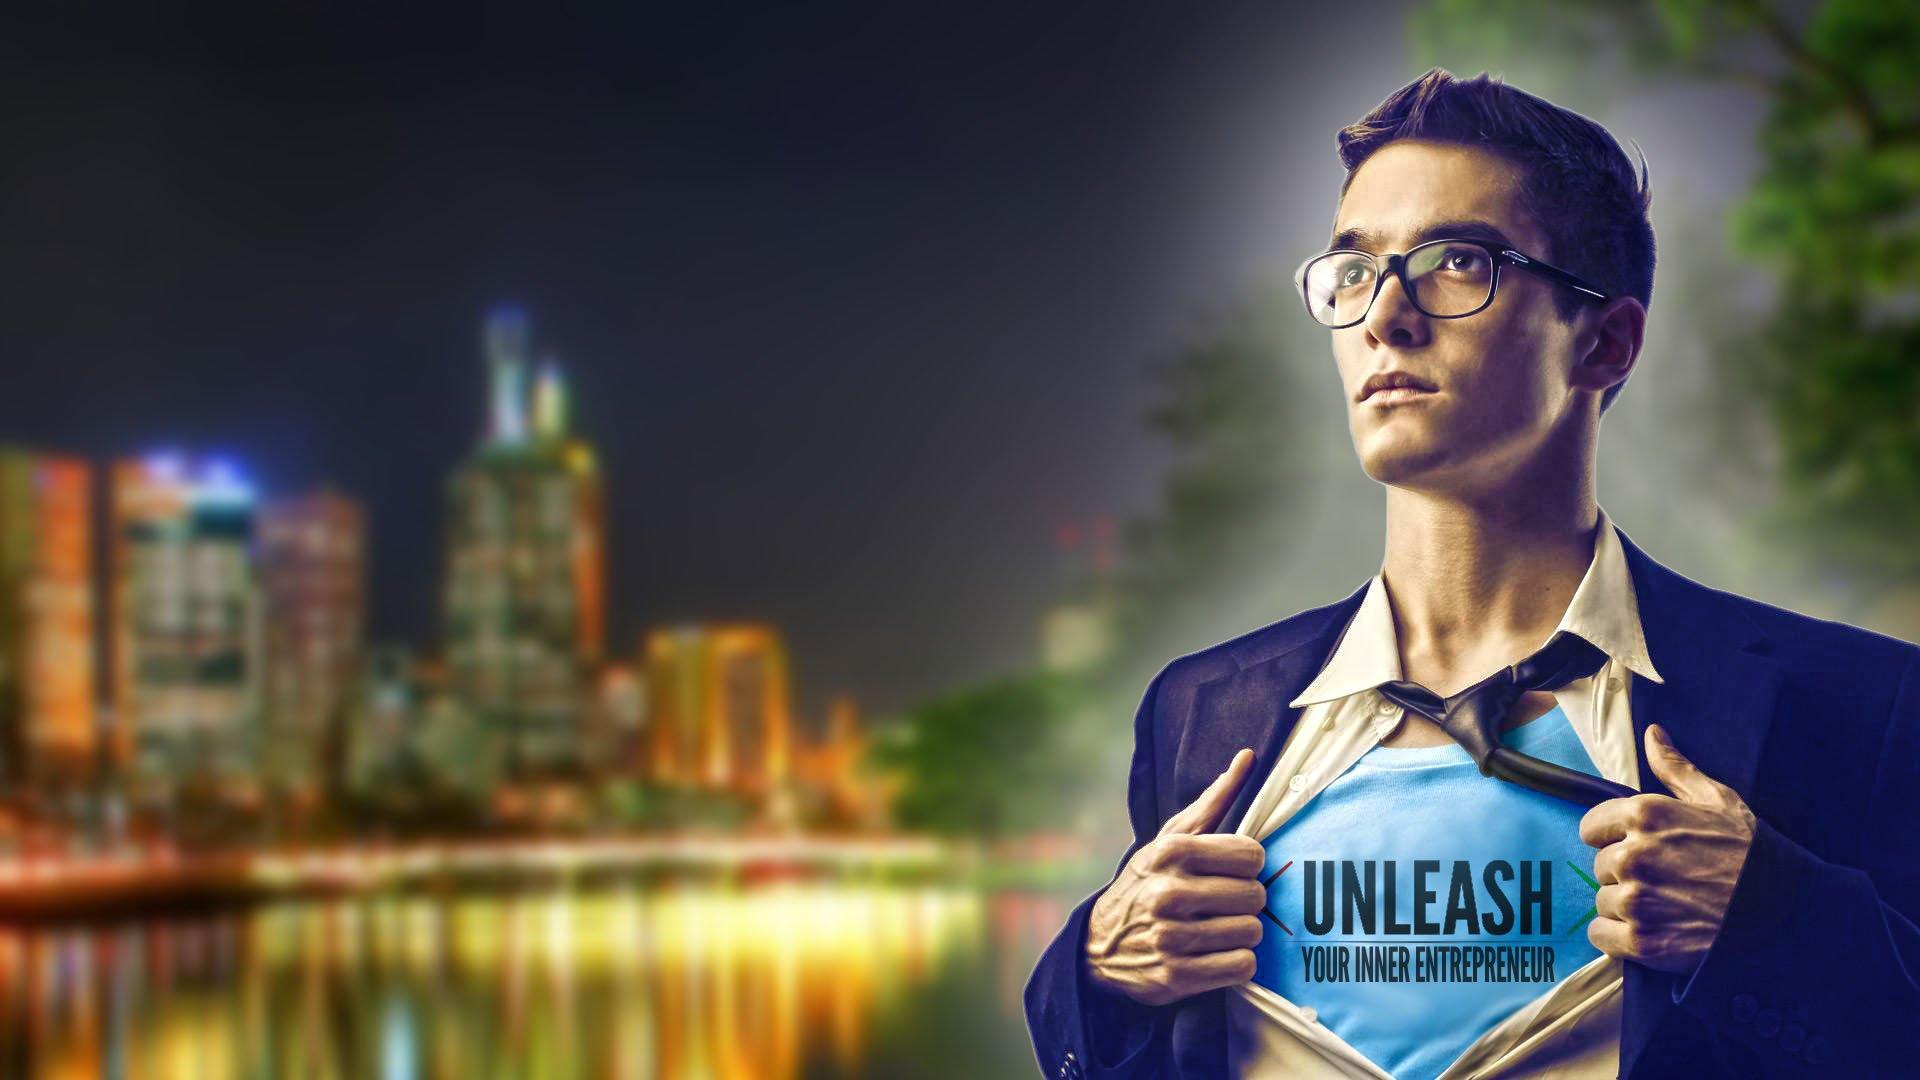 "Unleash The Entrepreneur Within Yourself - Image credit: <a href=""http://rogeranddani.com/meet-stuart-jay-six-figure-mentors"" target=""_blank"">SFM</a>"